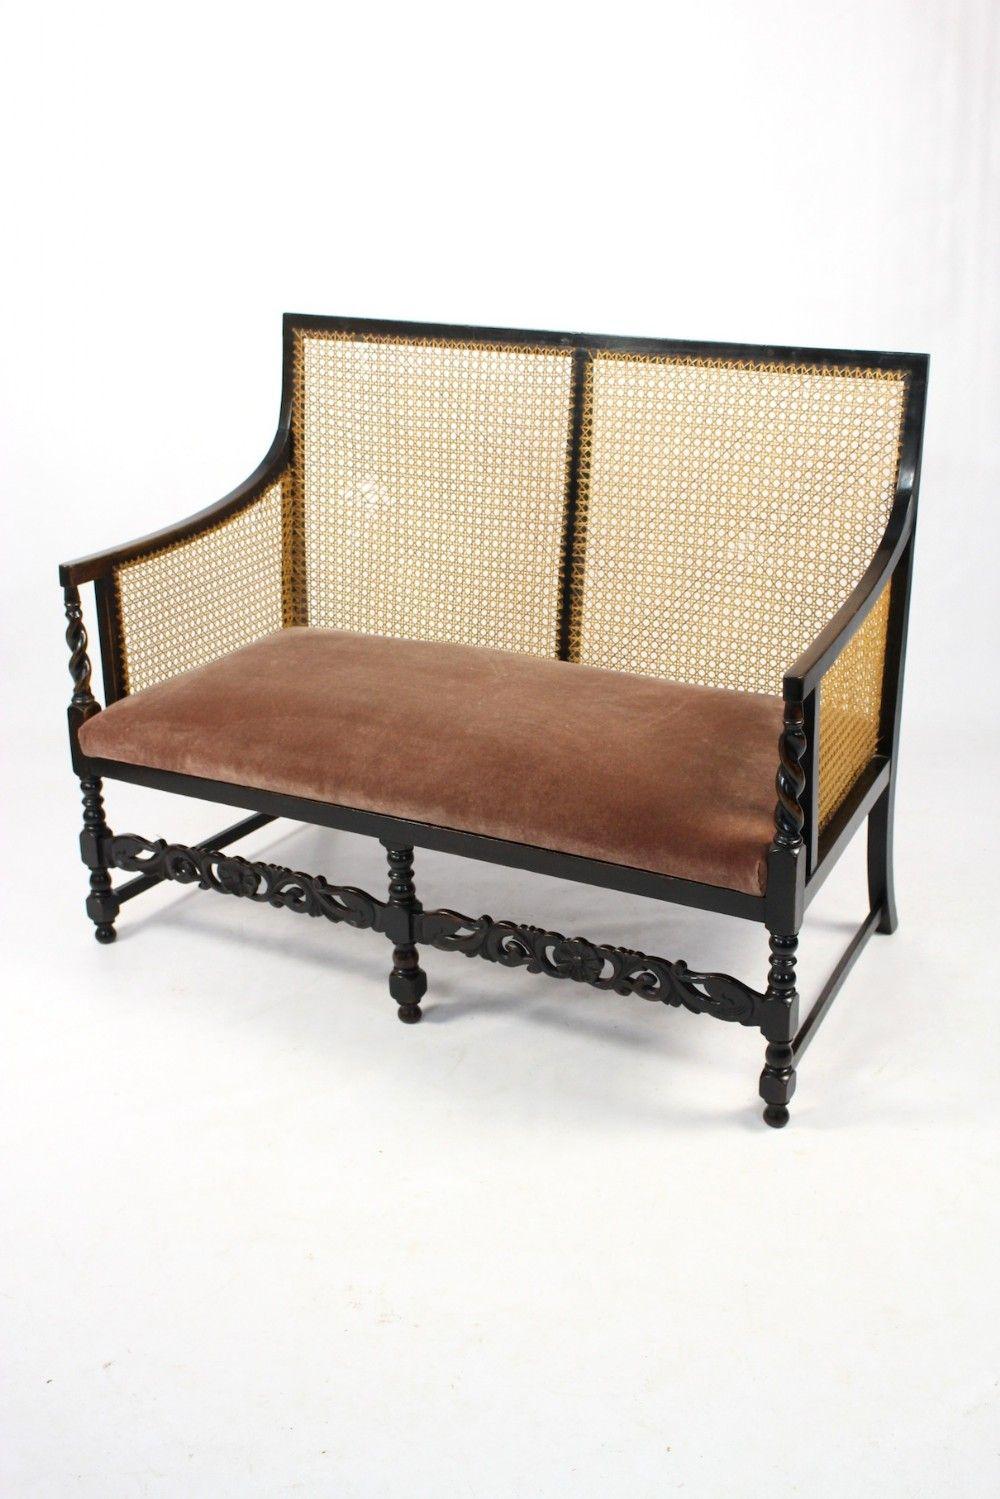 Antique Edwardian Ebonised Beech Bergere Cane Sofa Settee Seat